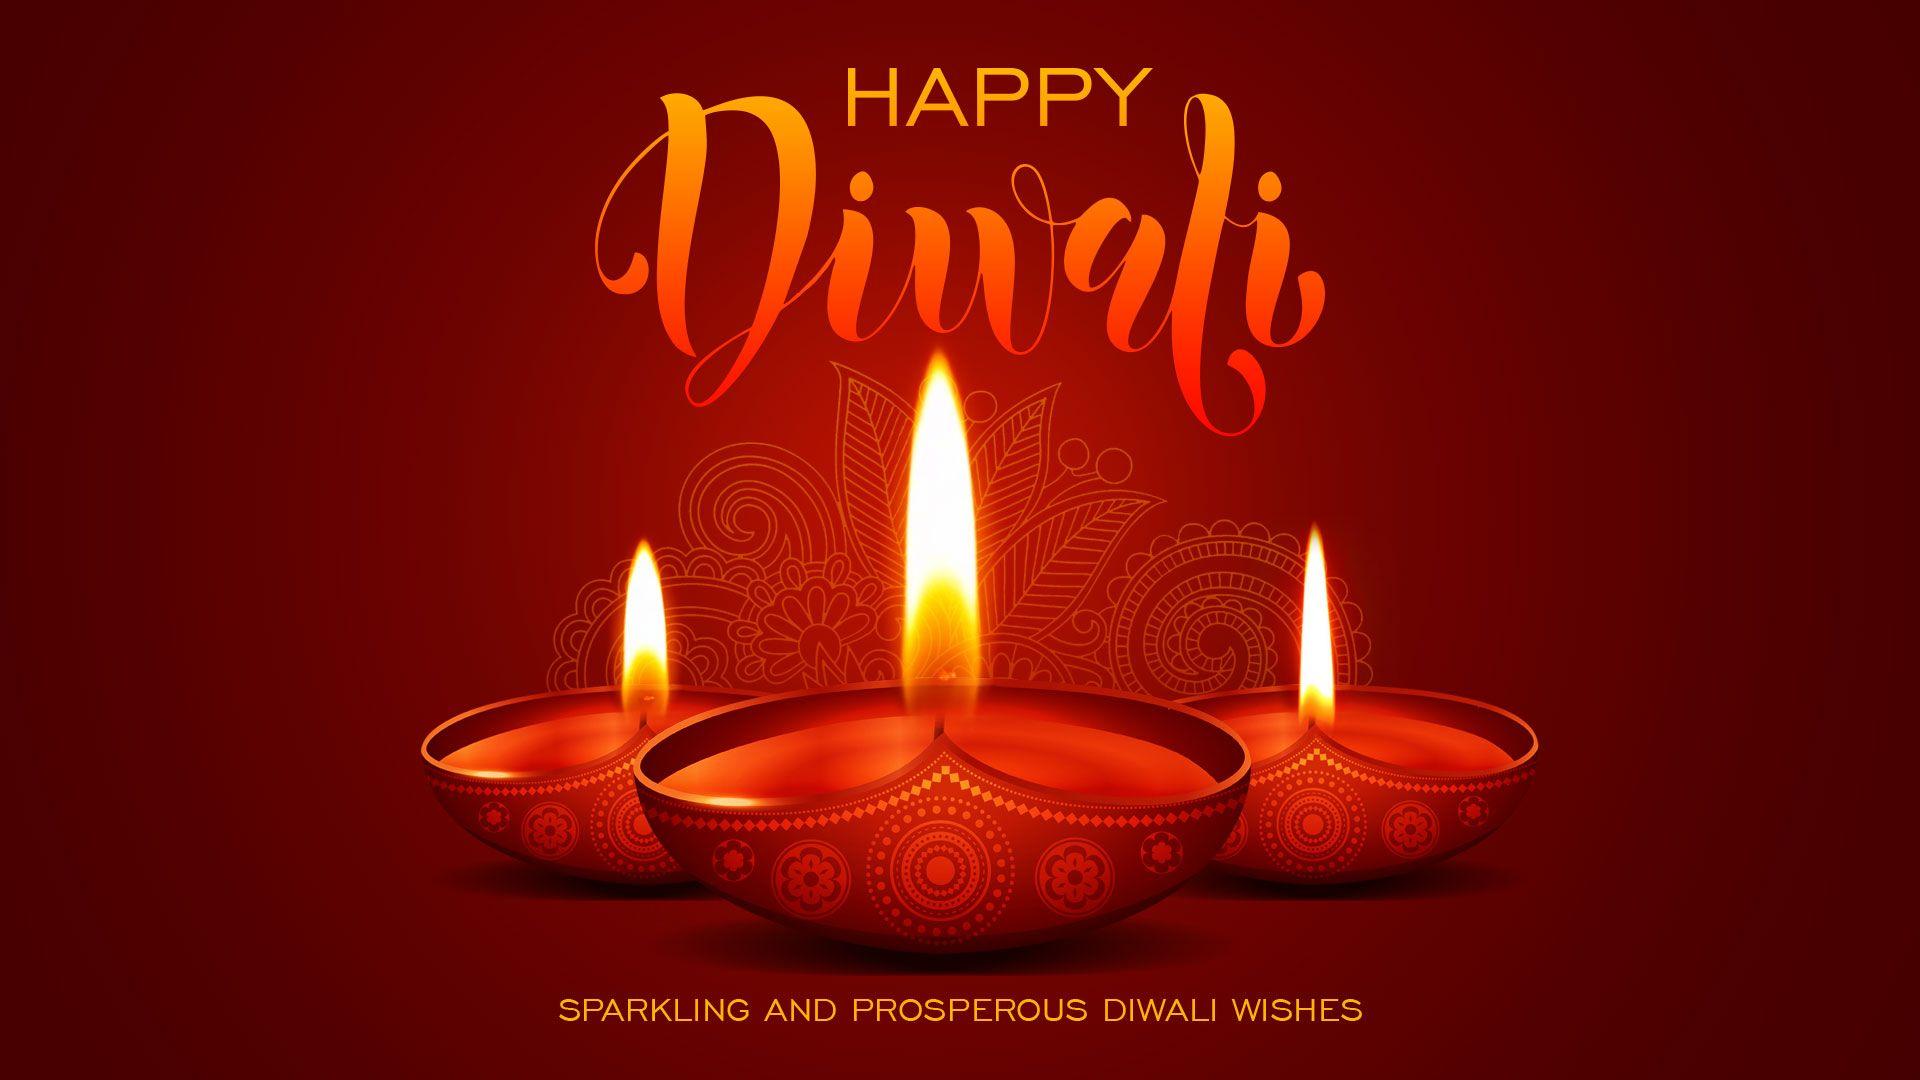 Diwali Greeting Online Download Diwali In 2018 Pinterest